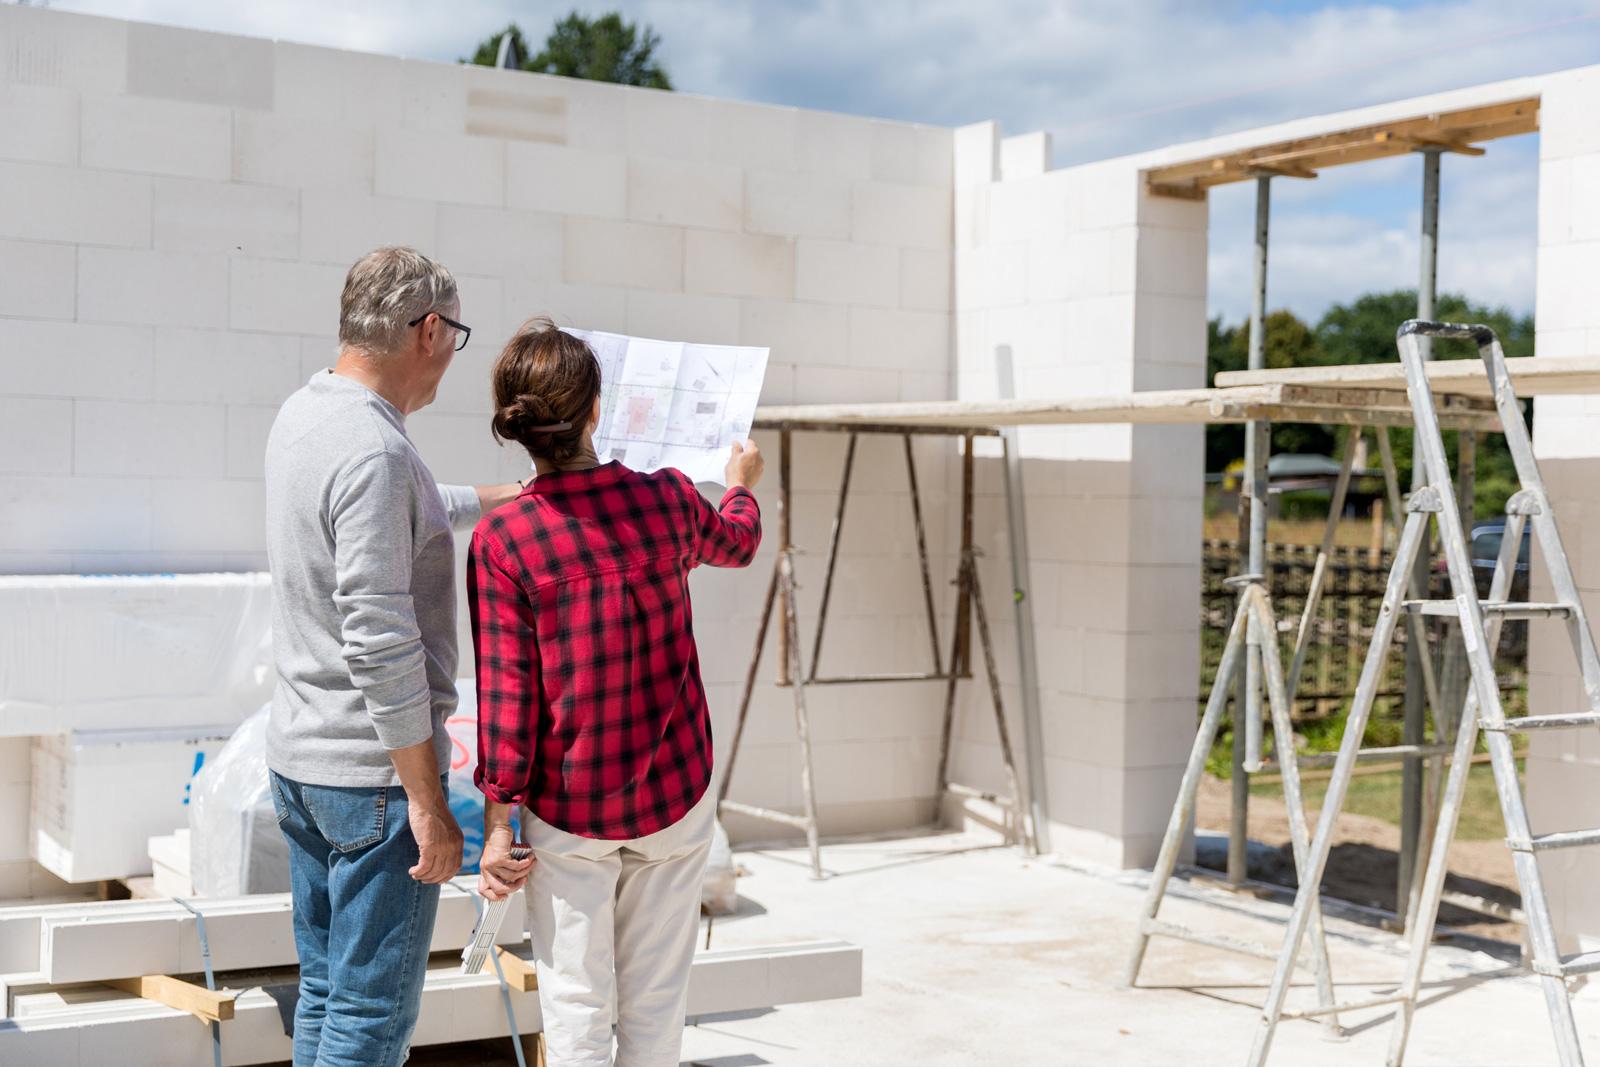 Ein Neubau kann nervenaufreibend sein.